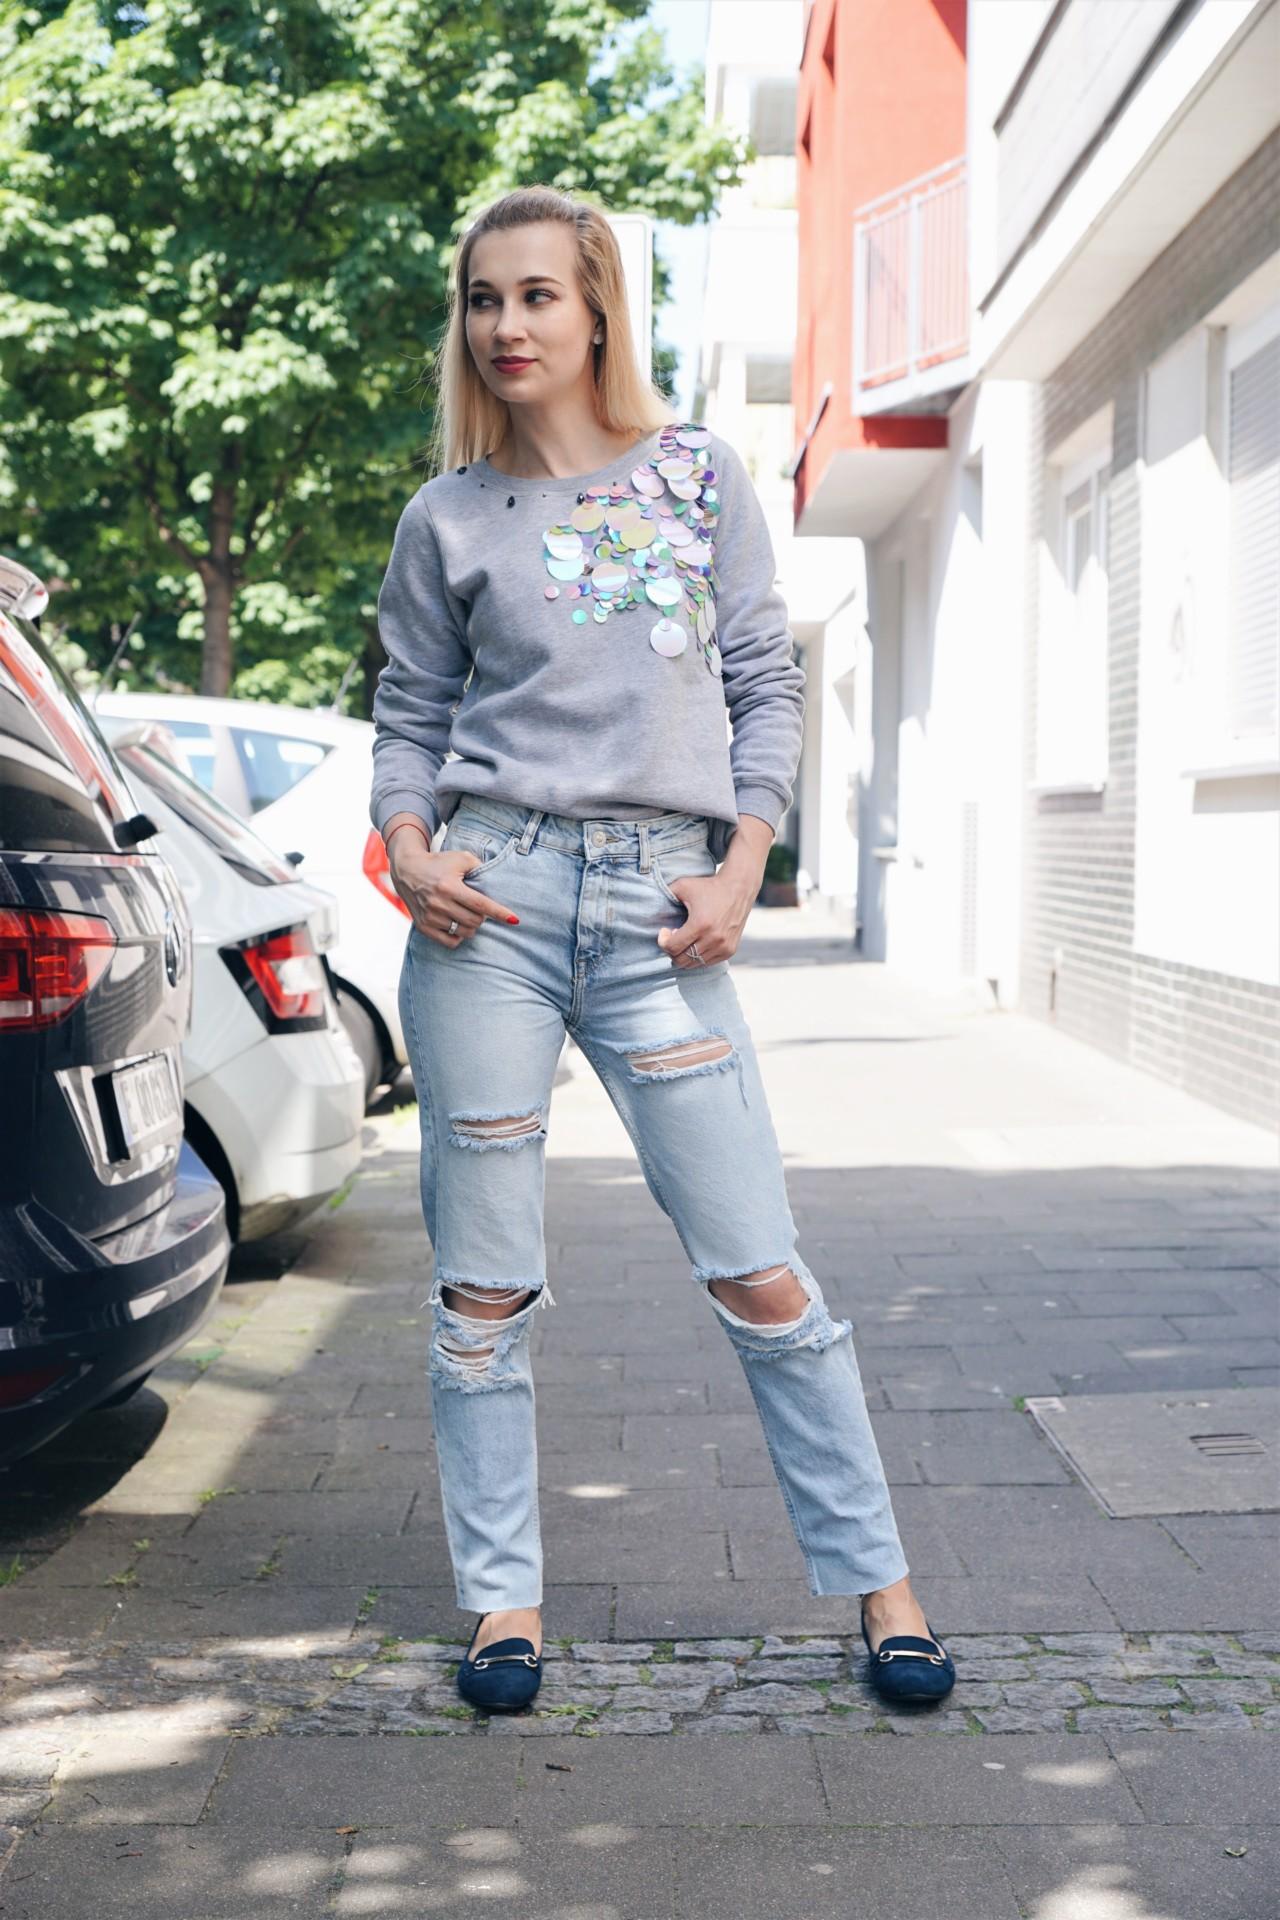 dbkstylez_fashionblog_mode_fashion_bestblog_bershka_streetstyle_moda_мода_стиль_модныйблог